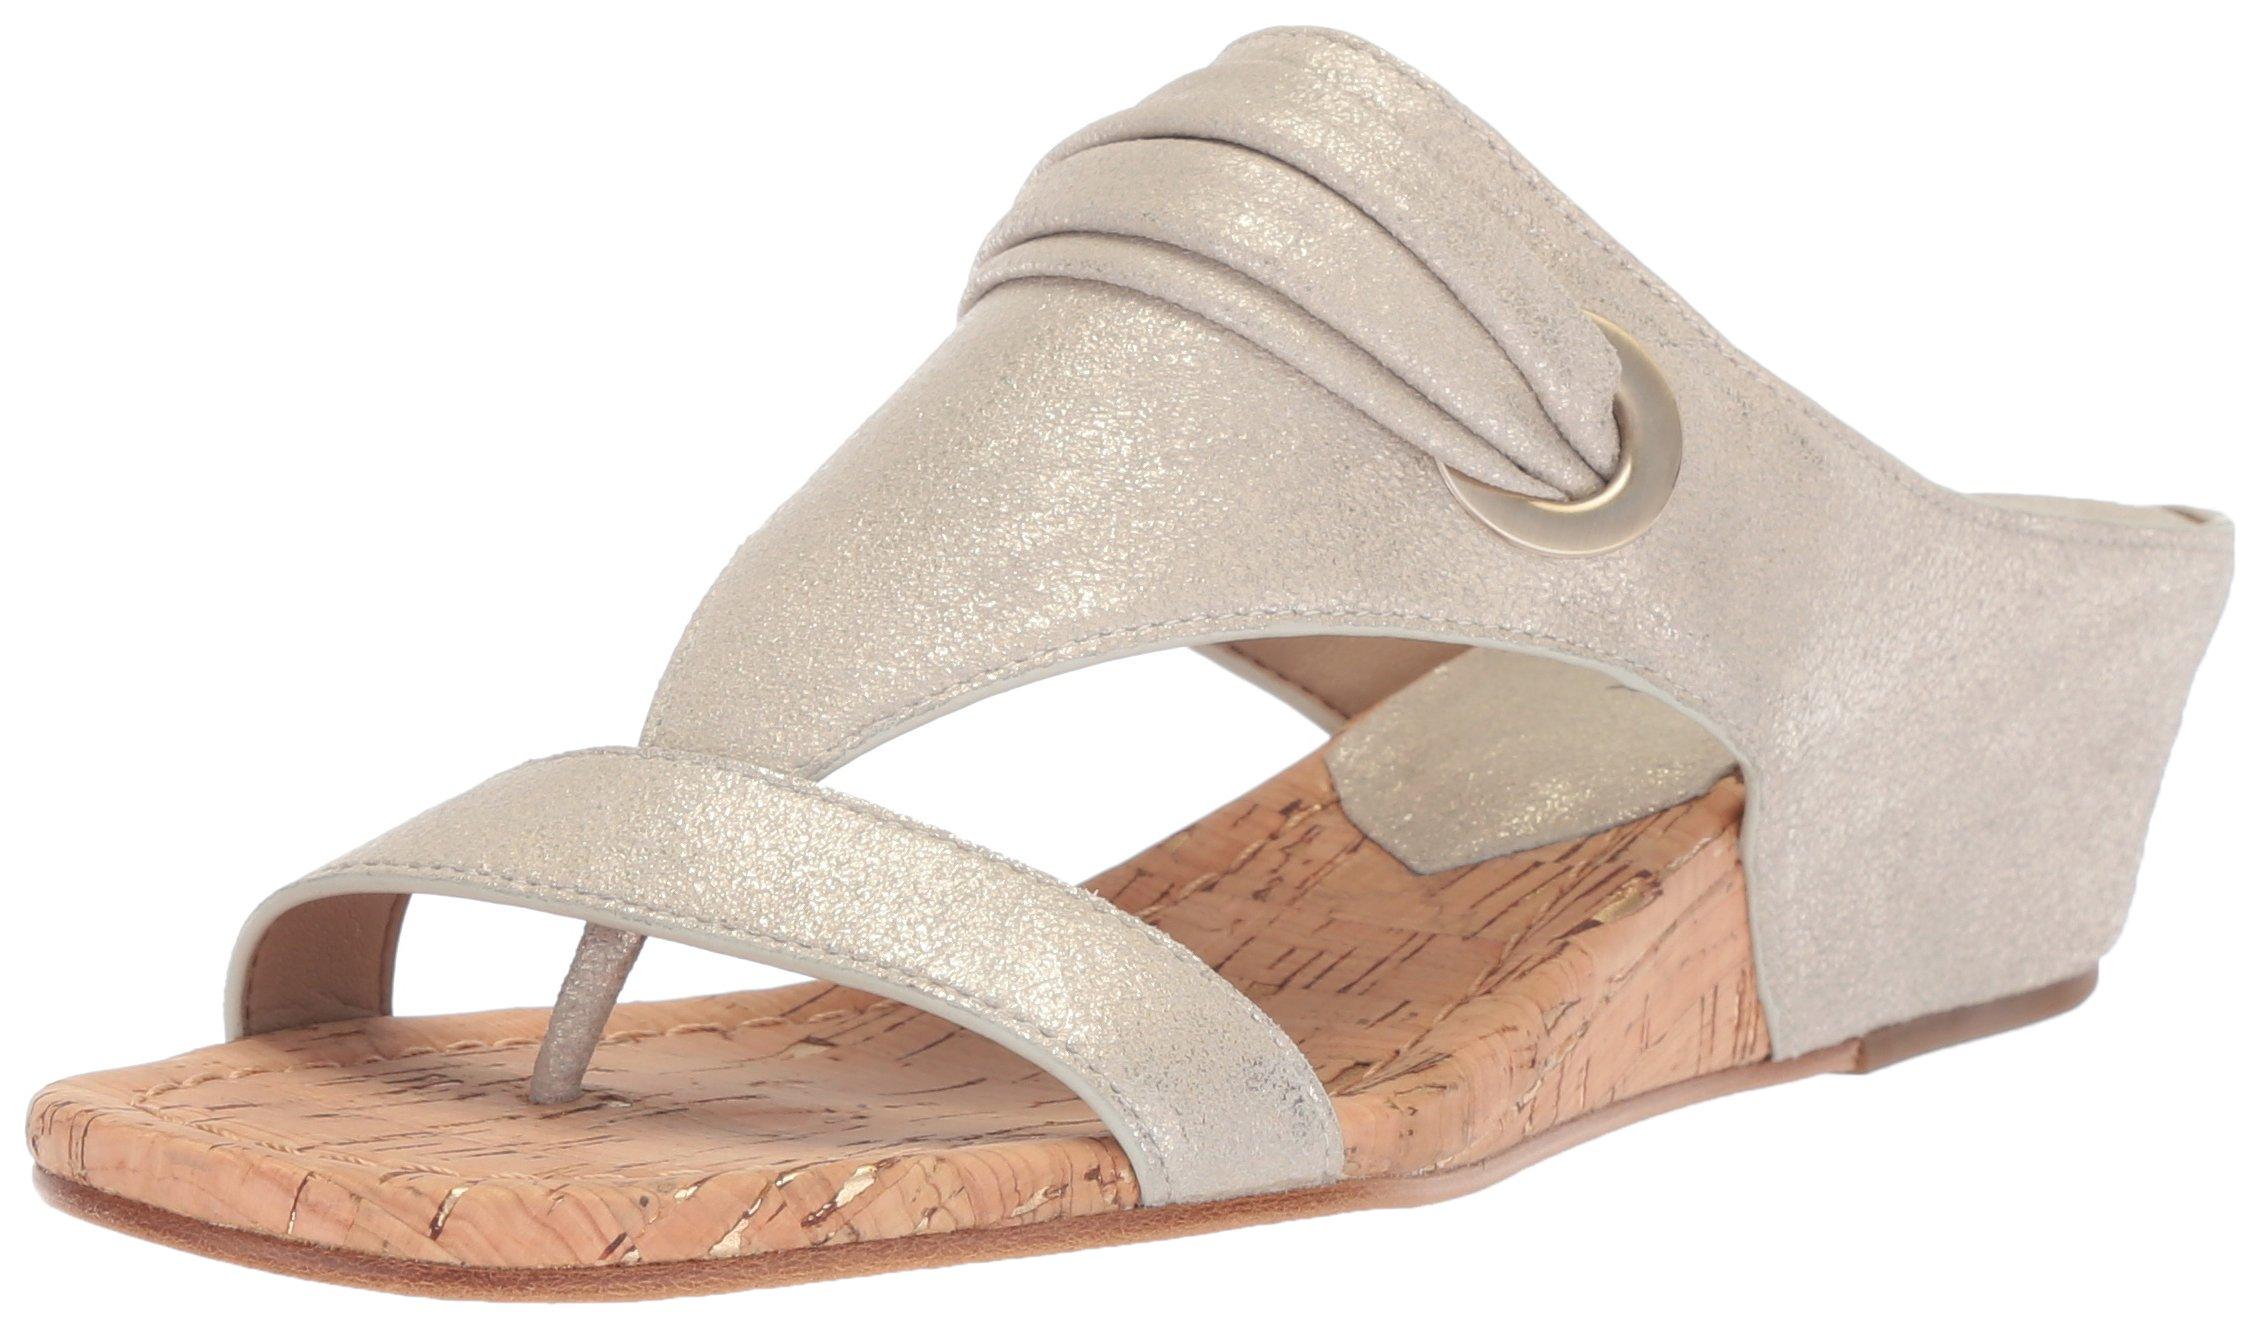 Donald J Pliner Women's Dionne Wedge Sandal, Platino, 10 Medium US